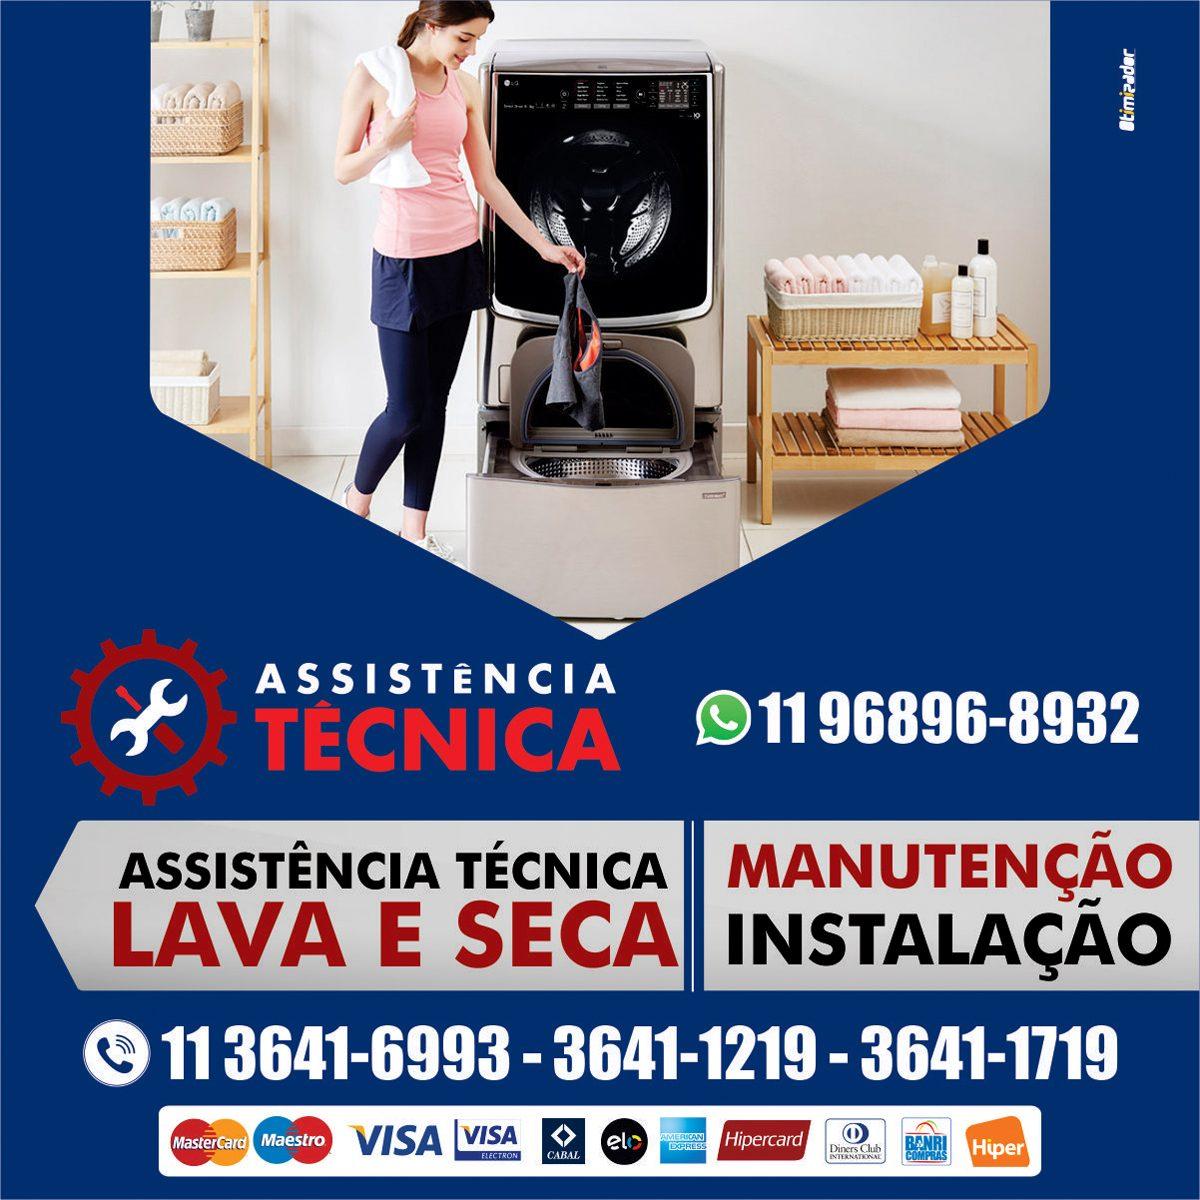 anuncio-credenciada-LAVA-E-SECA